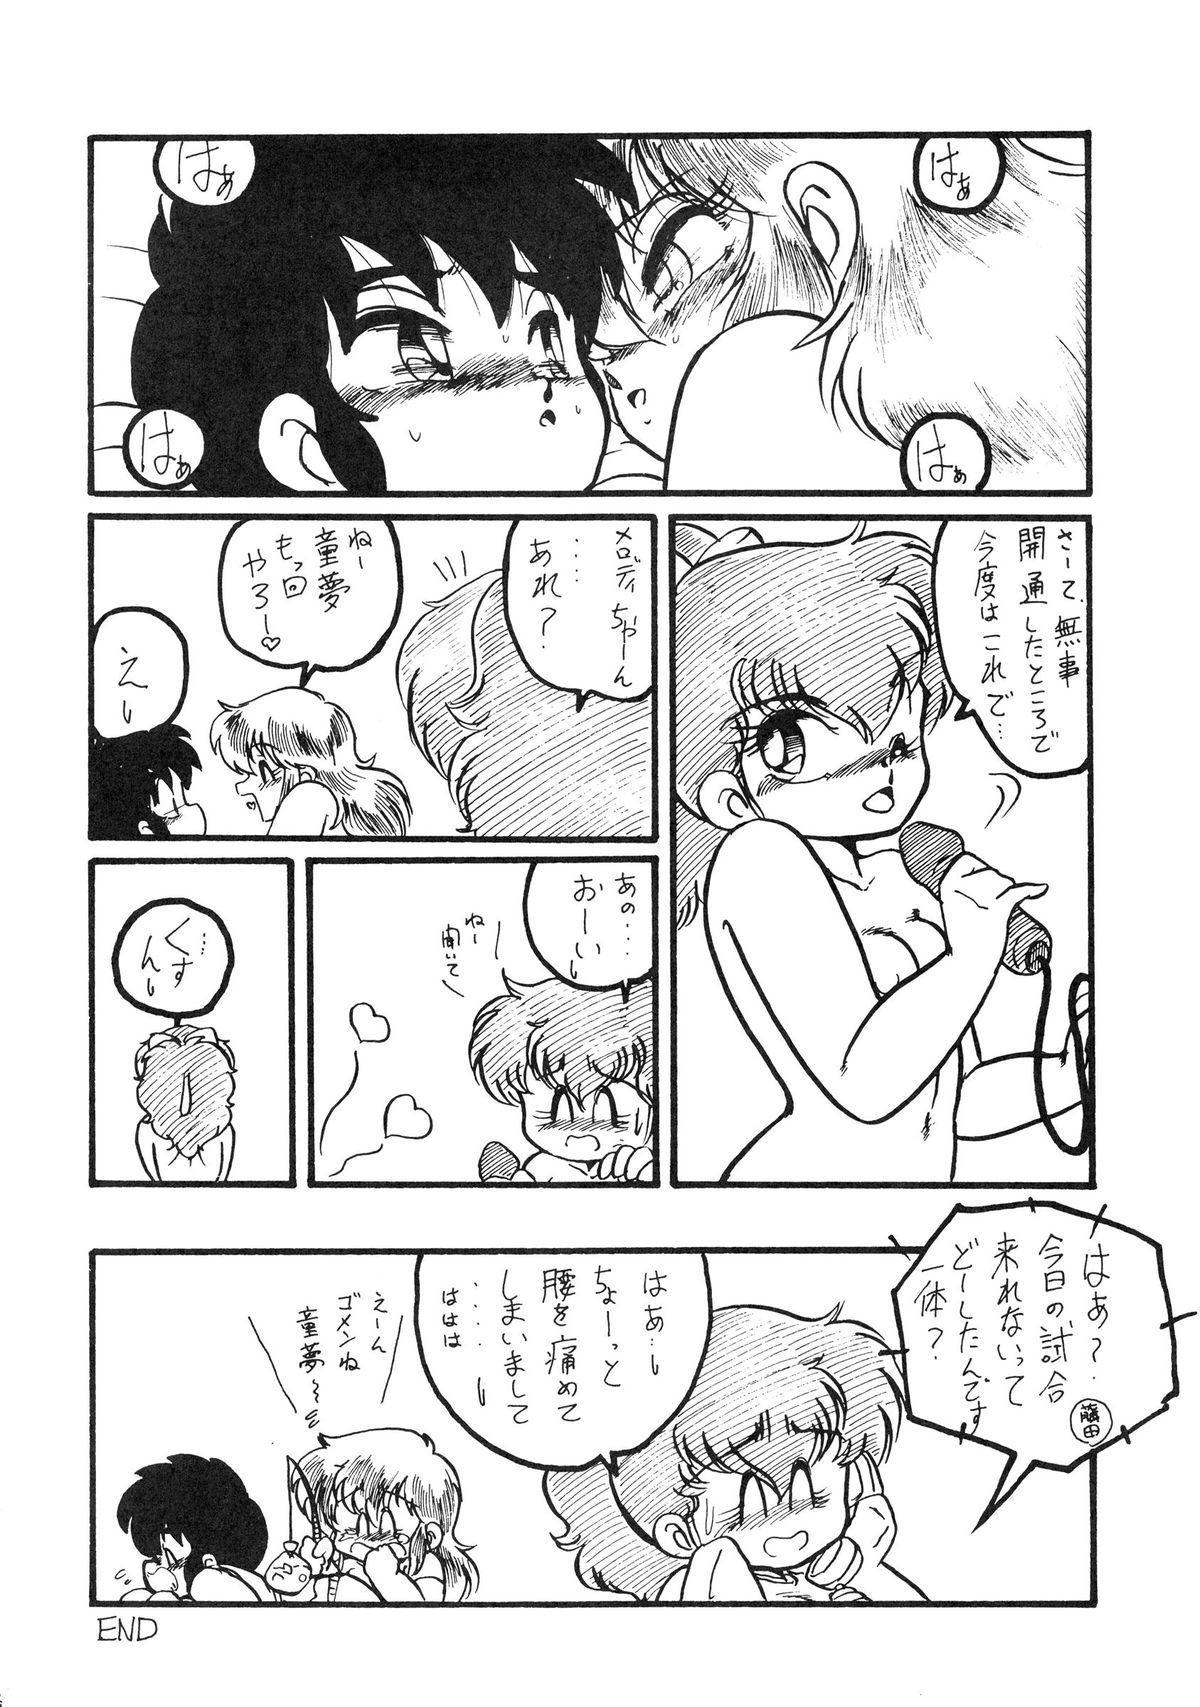 Hobaku Douga Musume - Zouho Kaiteiban 47